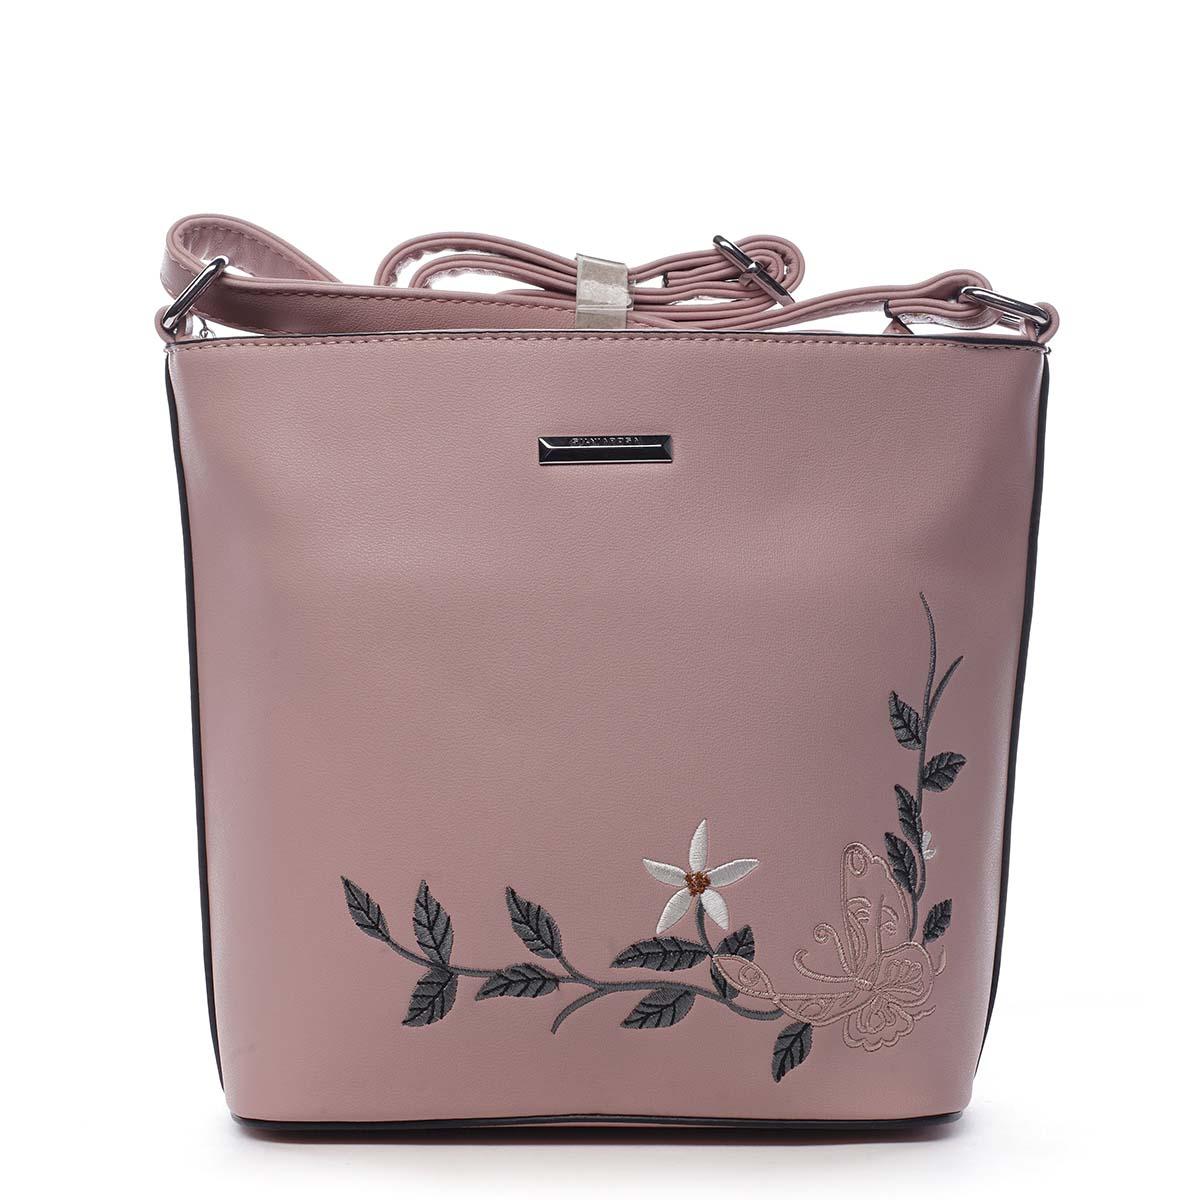 Dámská crossbody kabelka růžová - Silvia Rosa Believa